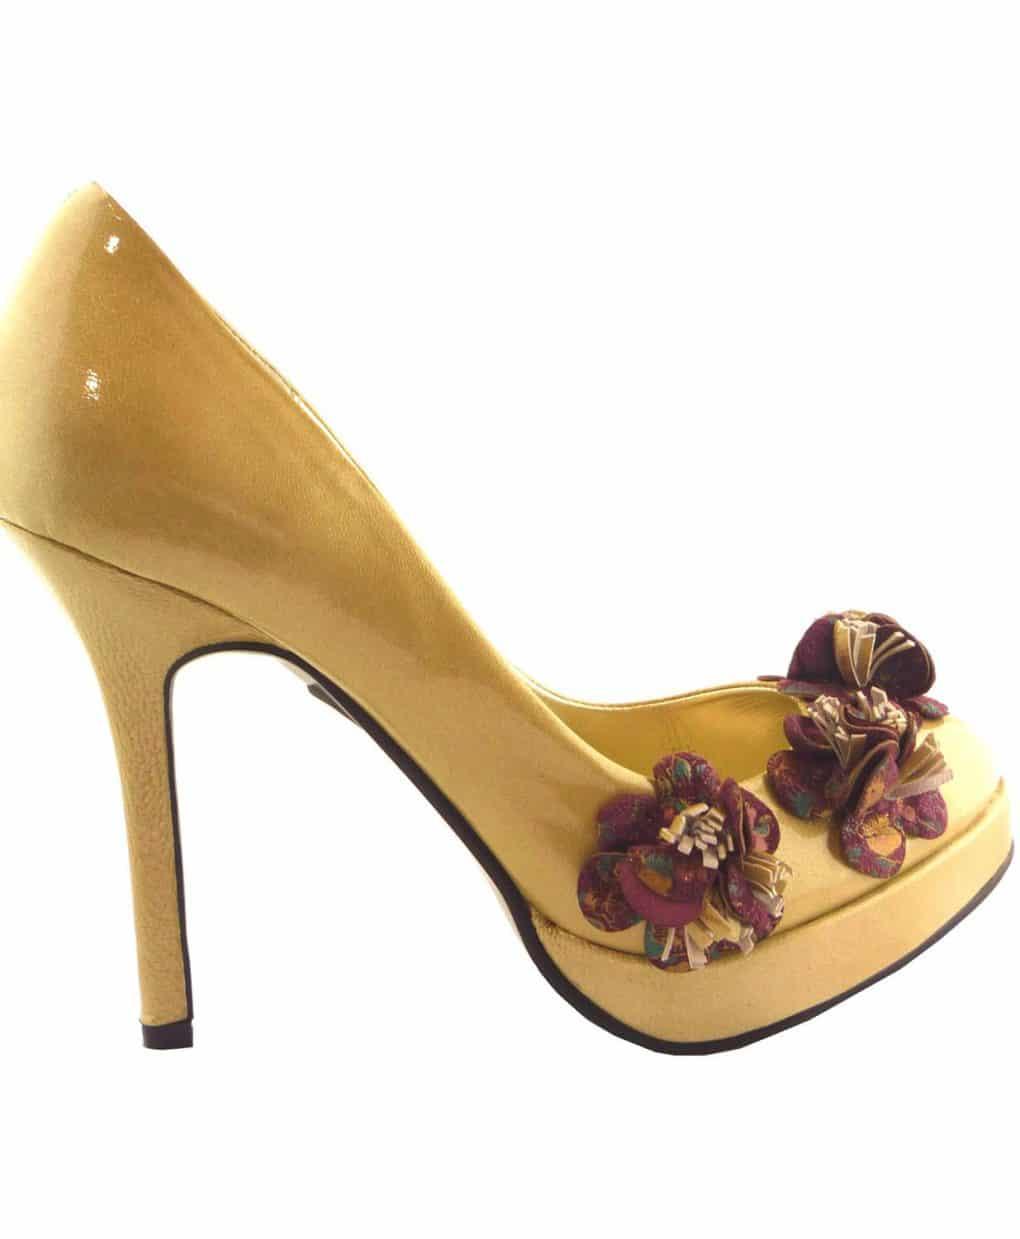 Minette-patent-flower-round-toe-heels-Alila